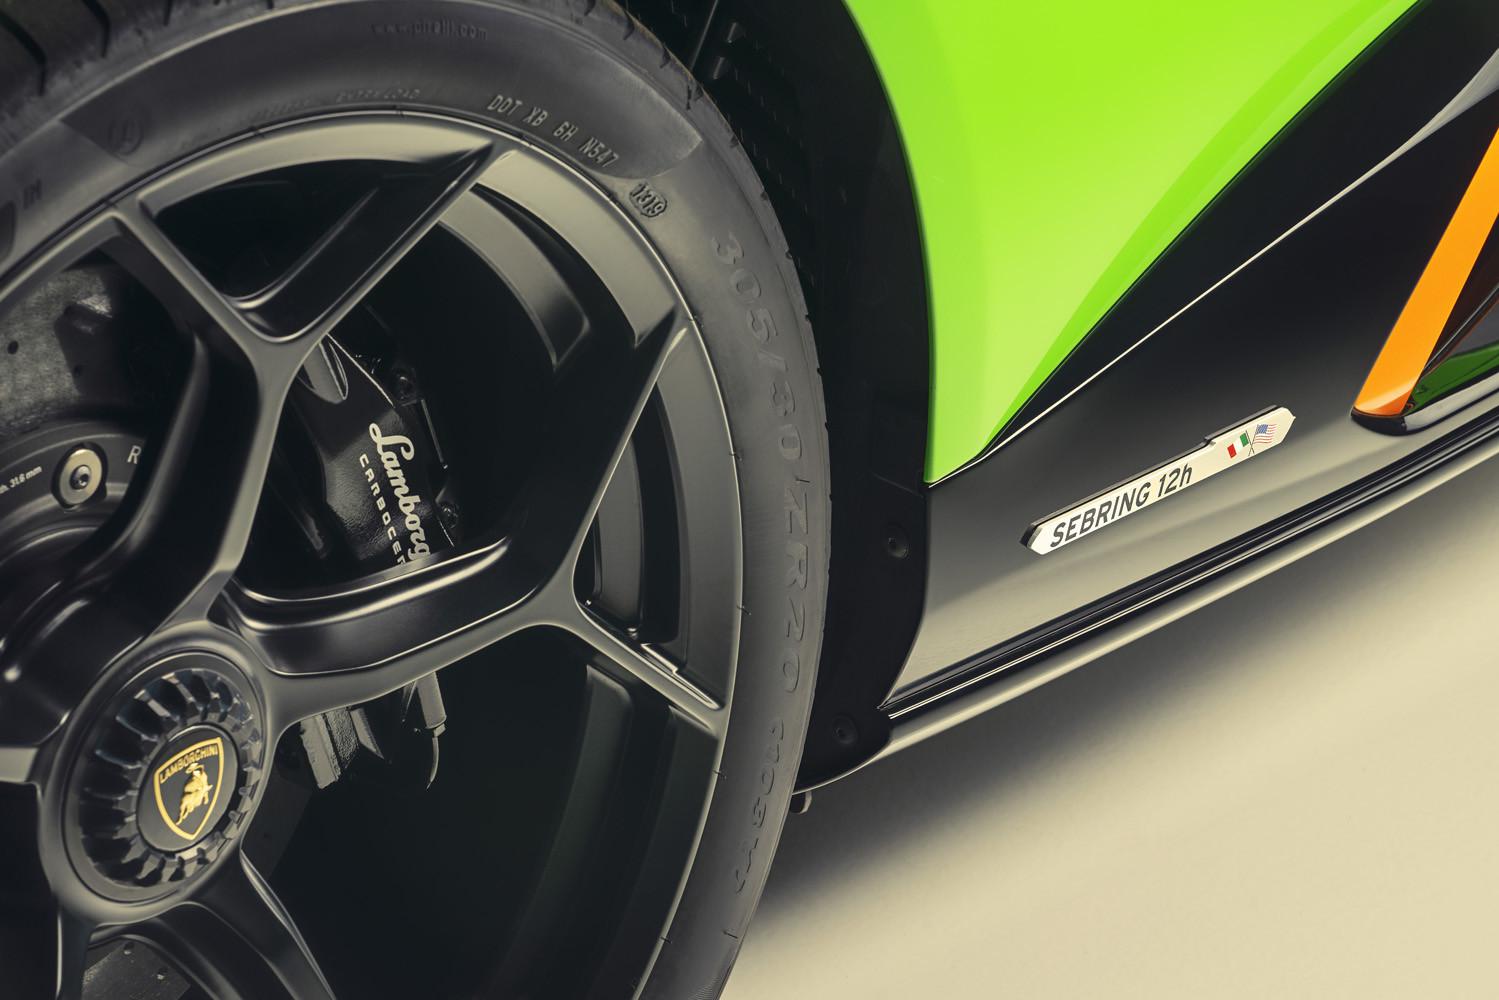 Foto de Lamborghini Aventador SVJ 63 Roadster y Huracán EVO GT Celebration (17/26)